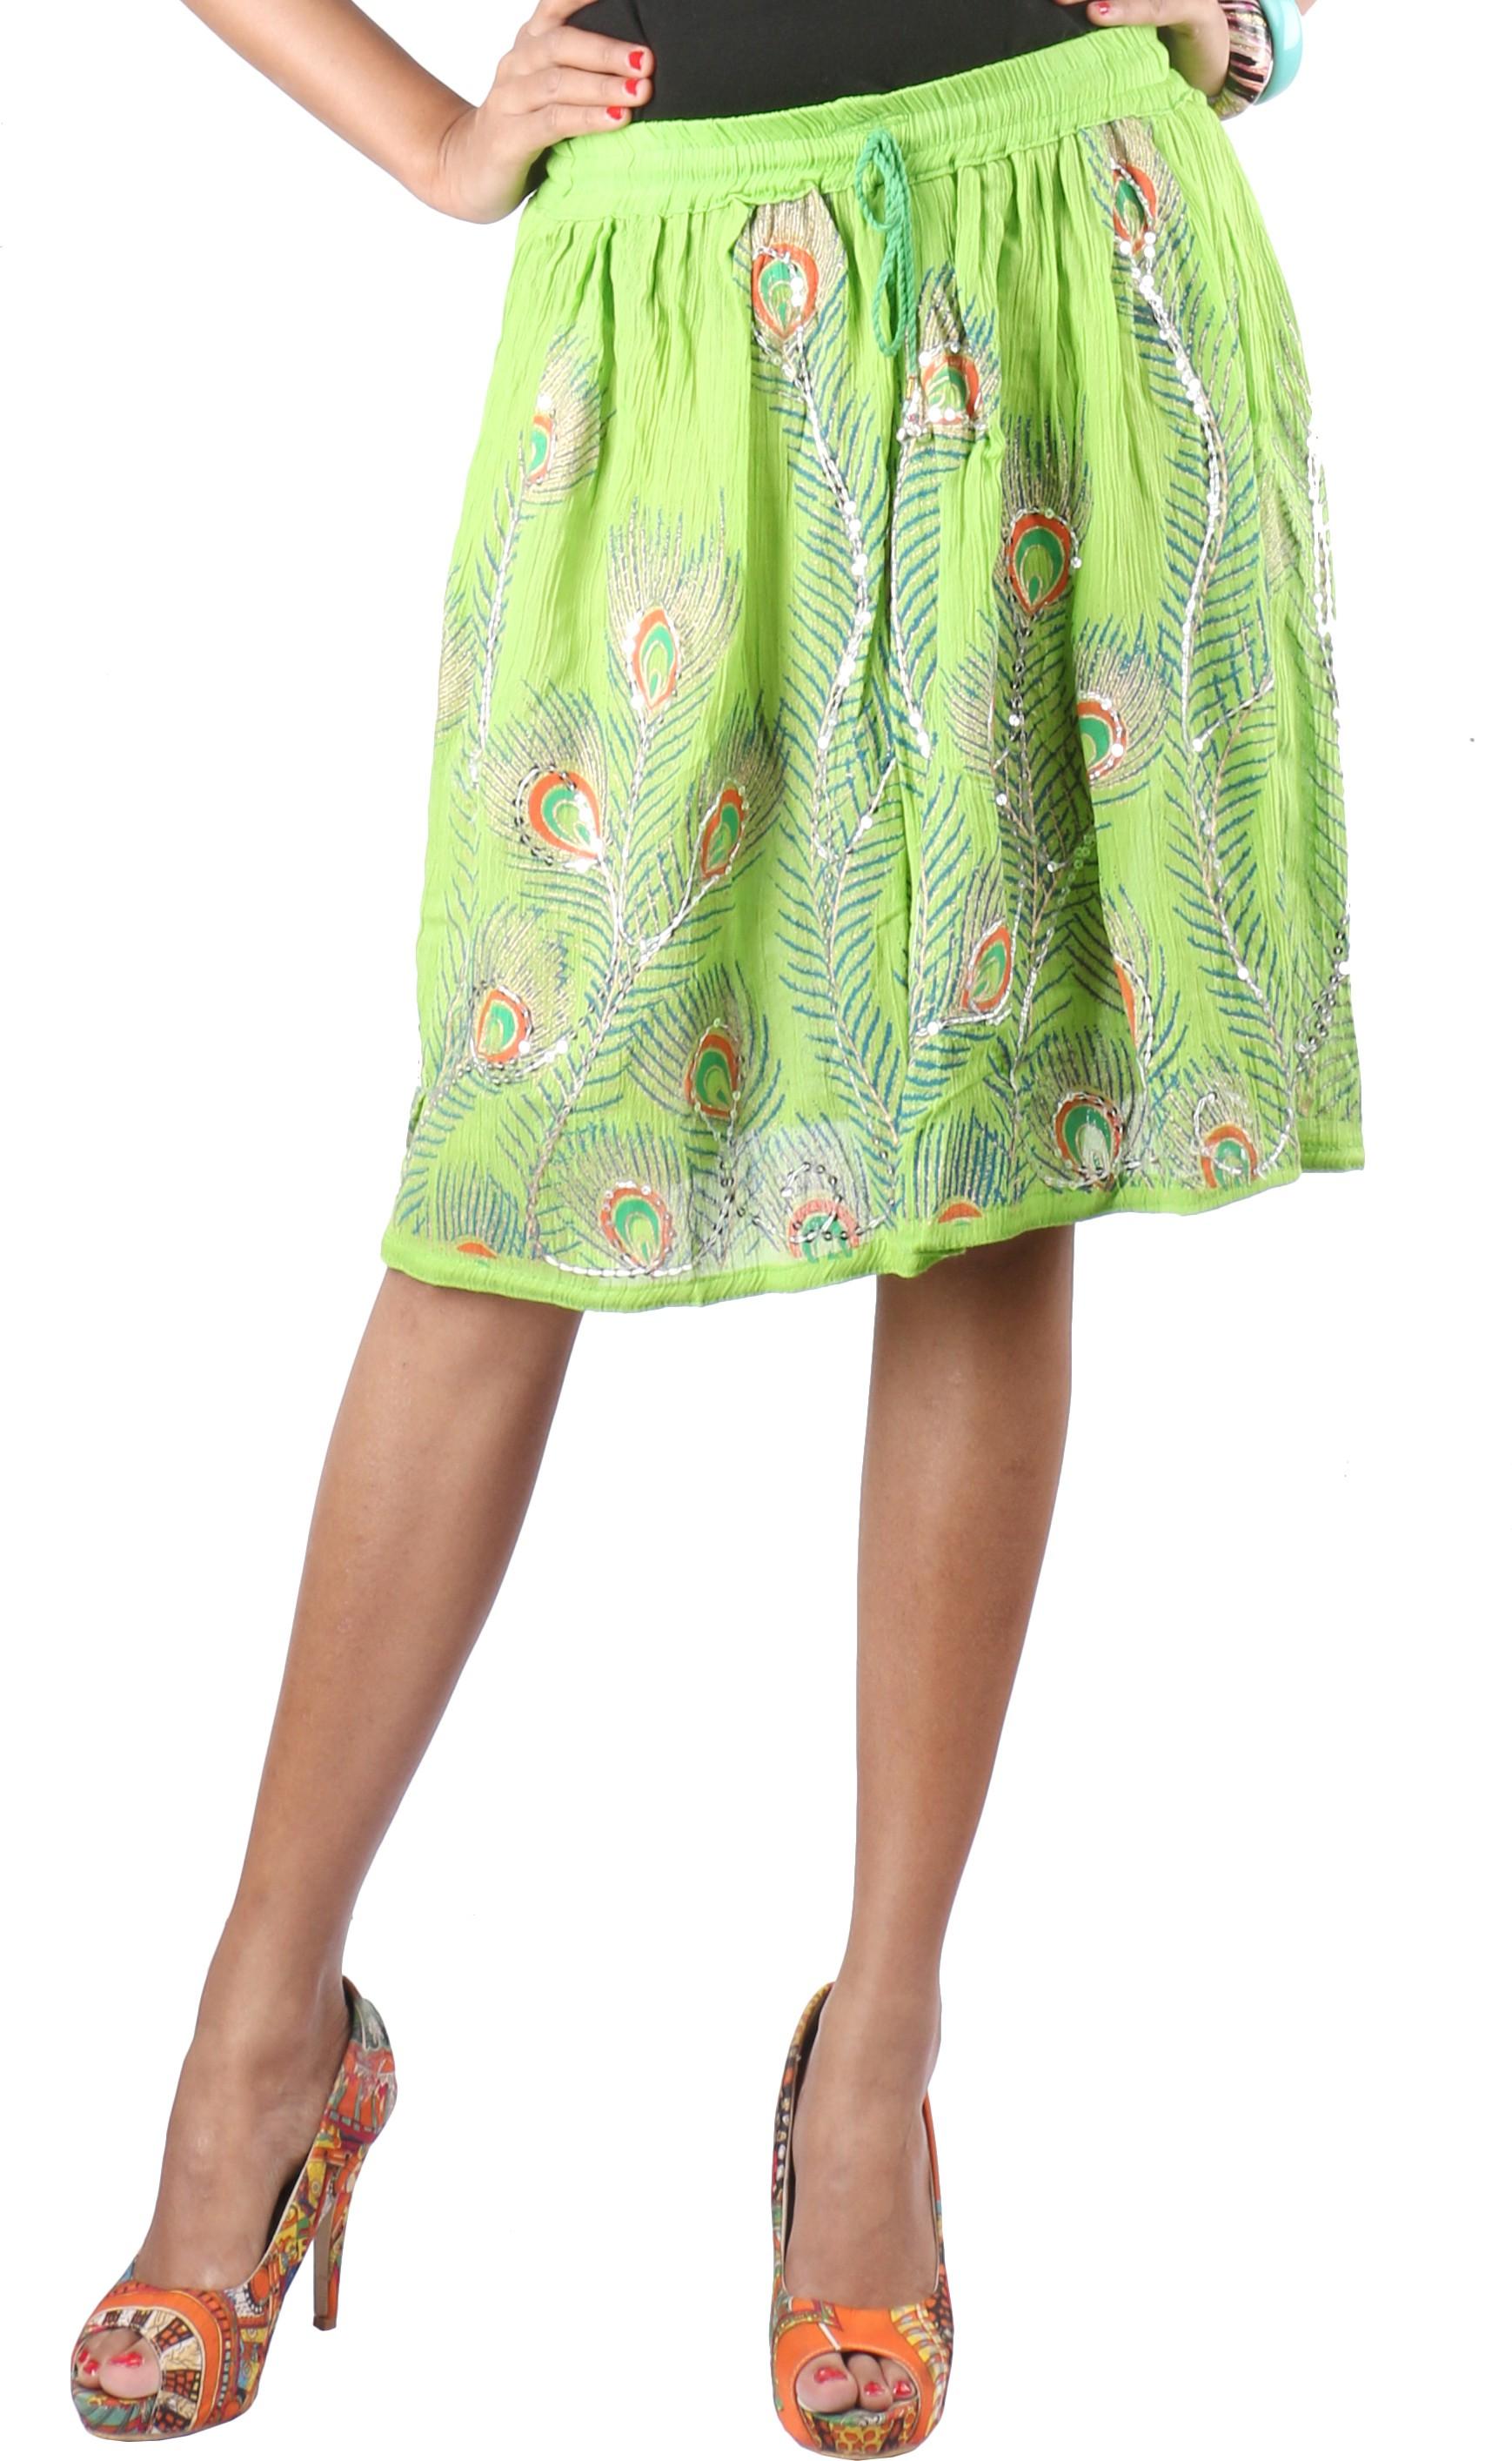 Indiankala4u Printed Womens Broomstick Green Skirt